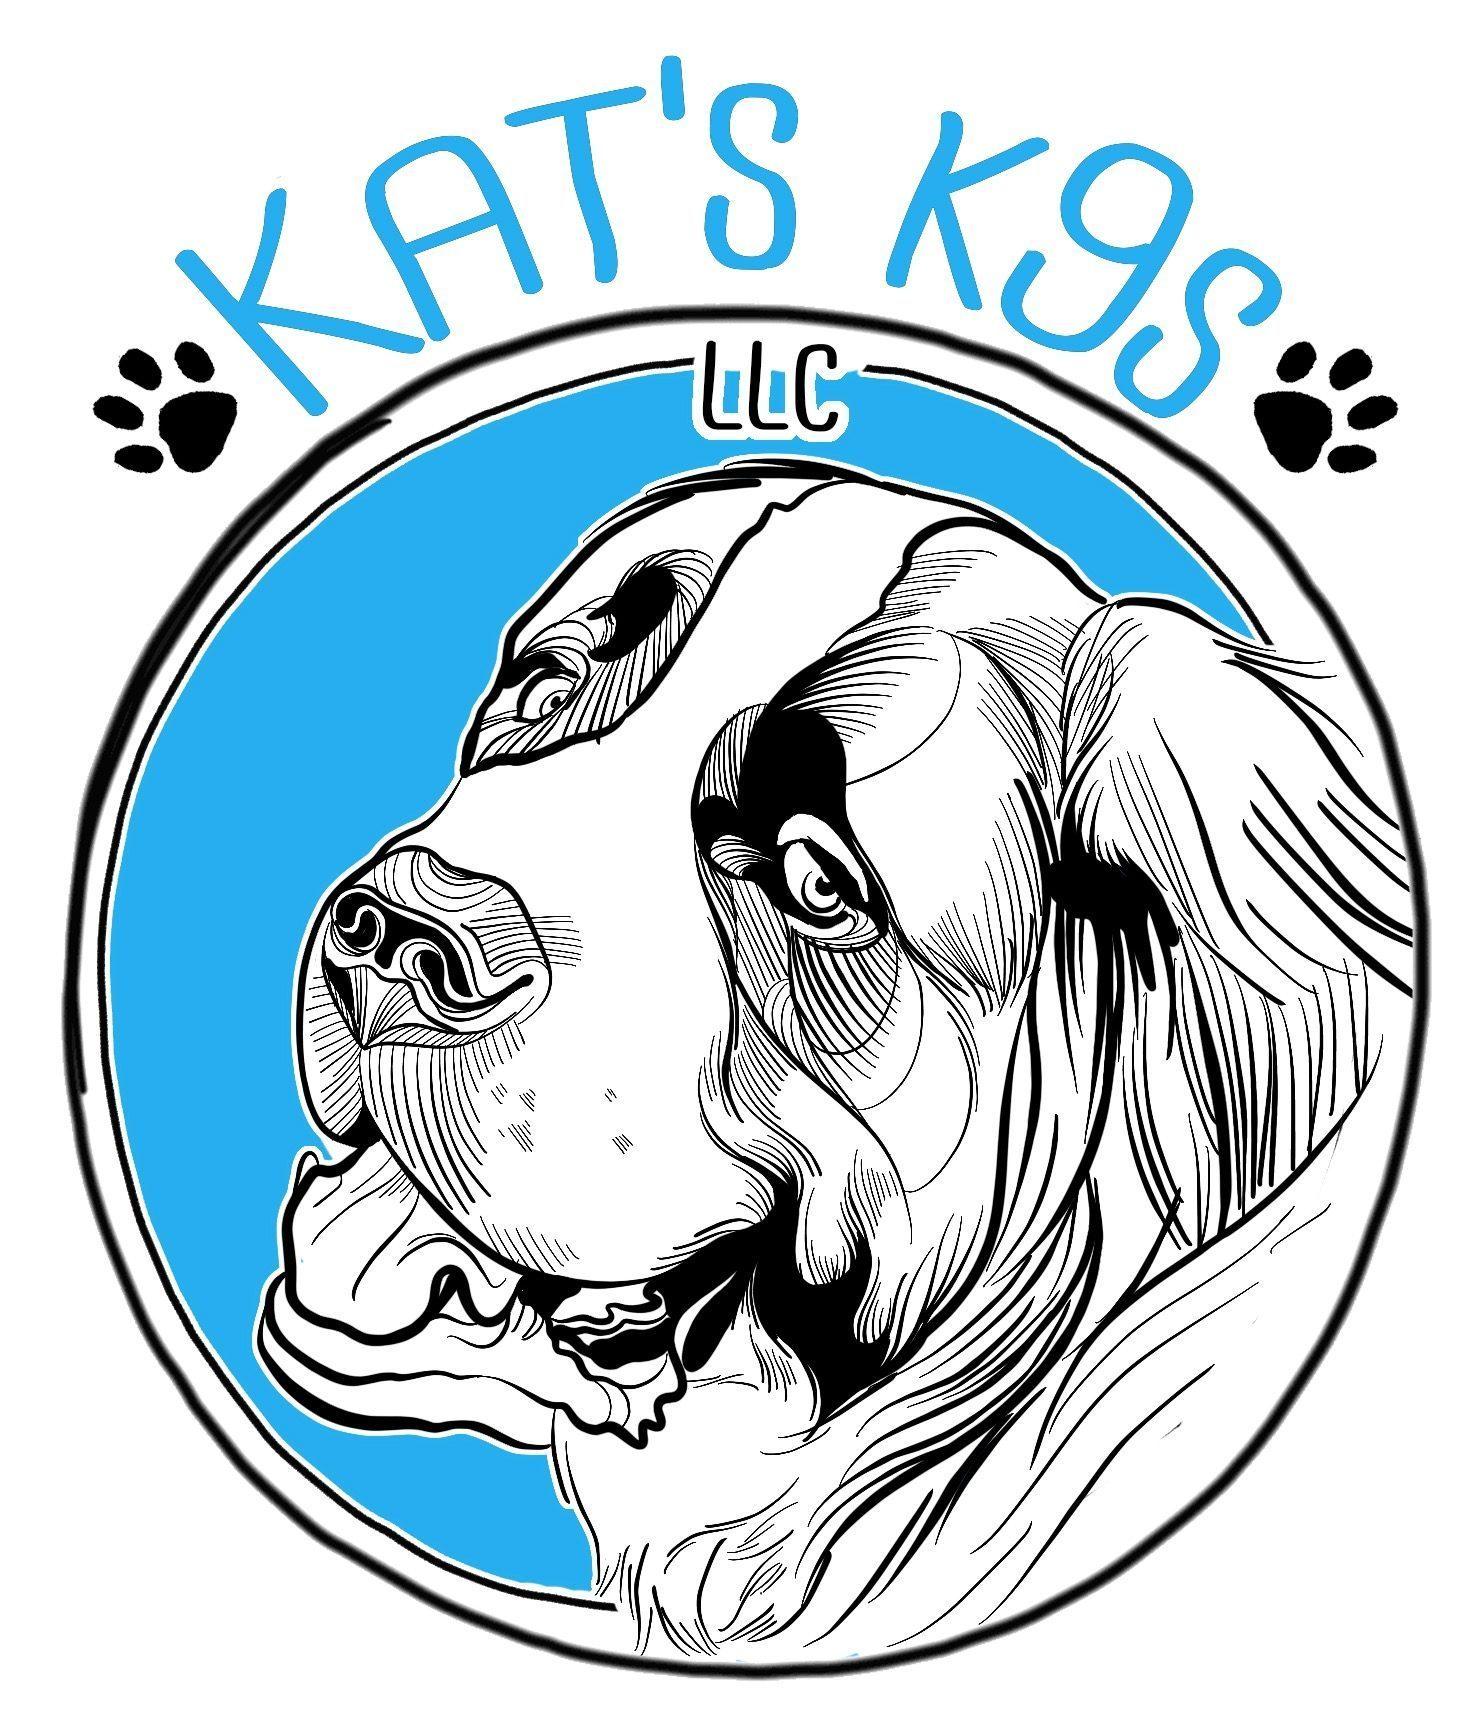 kat's k9s.jpeg